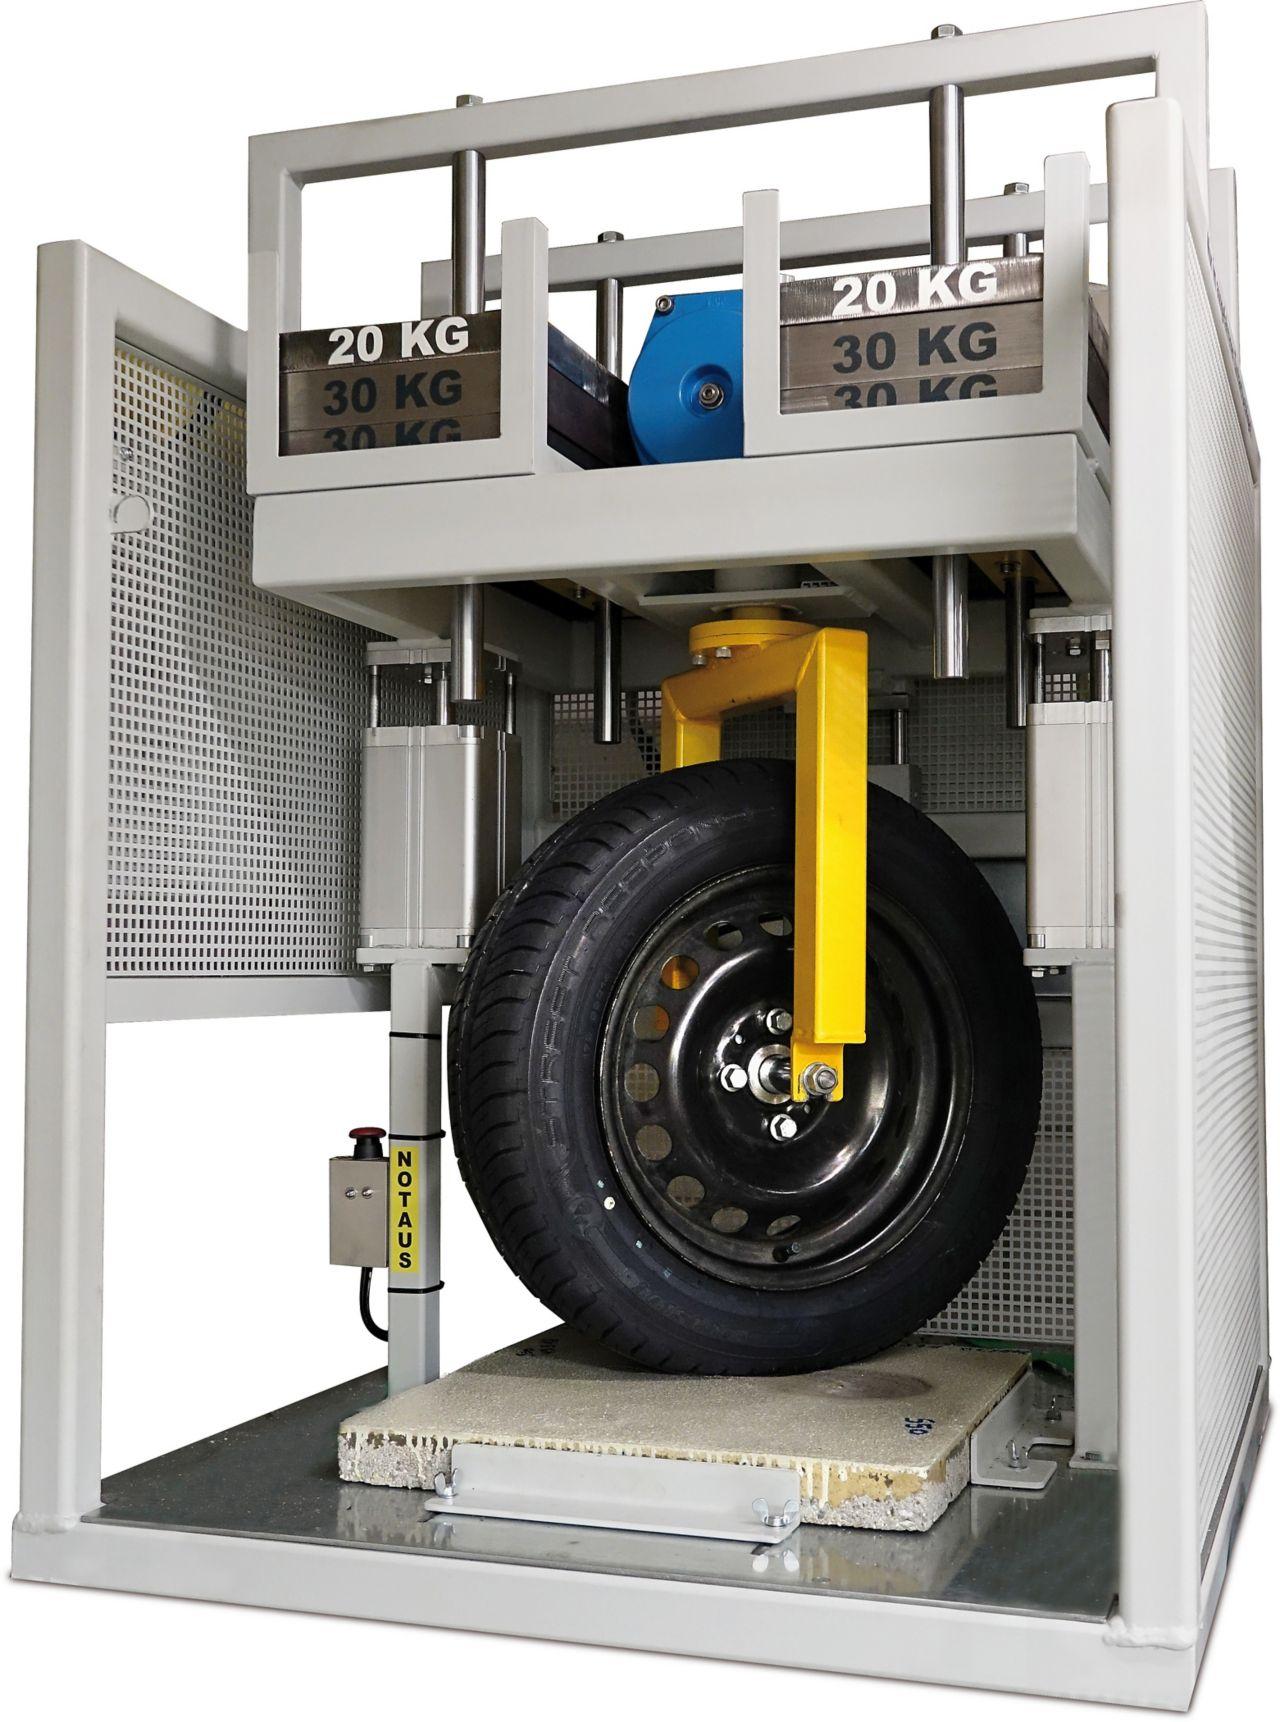 Parking abrasion test to measure car park floor wear resistance under a wheel load